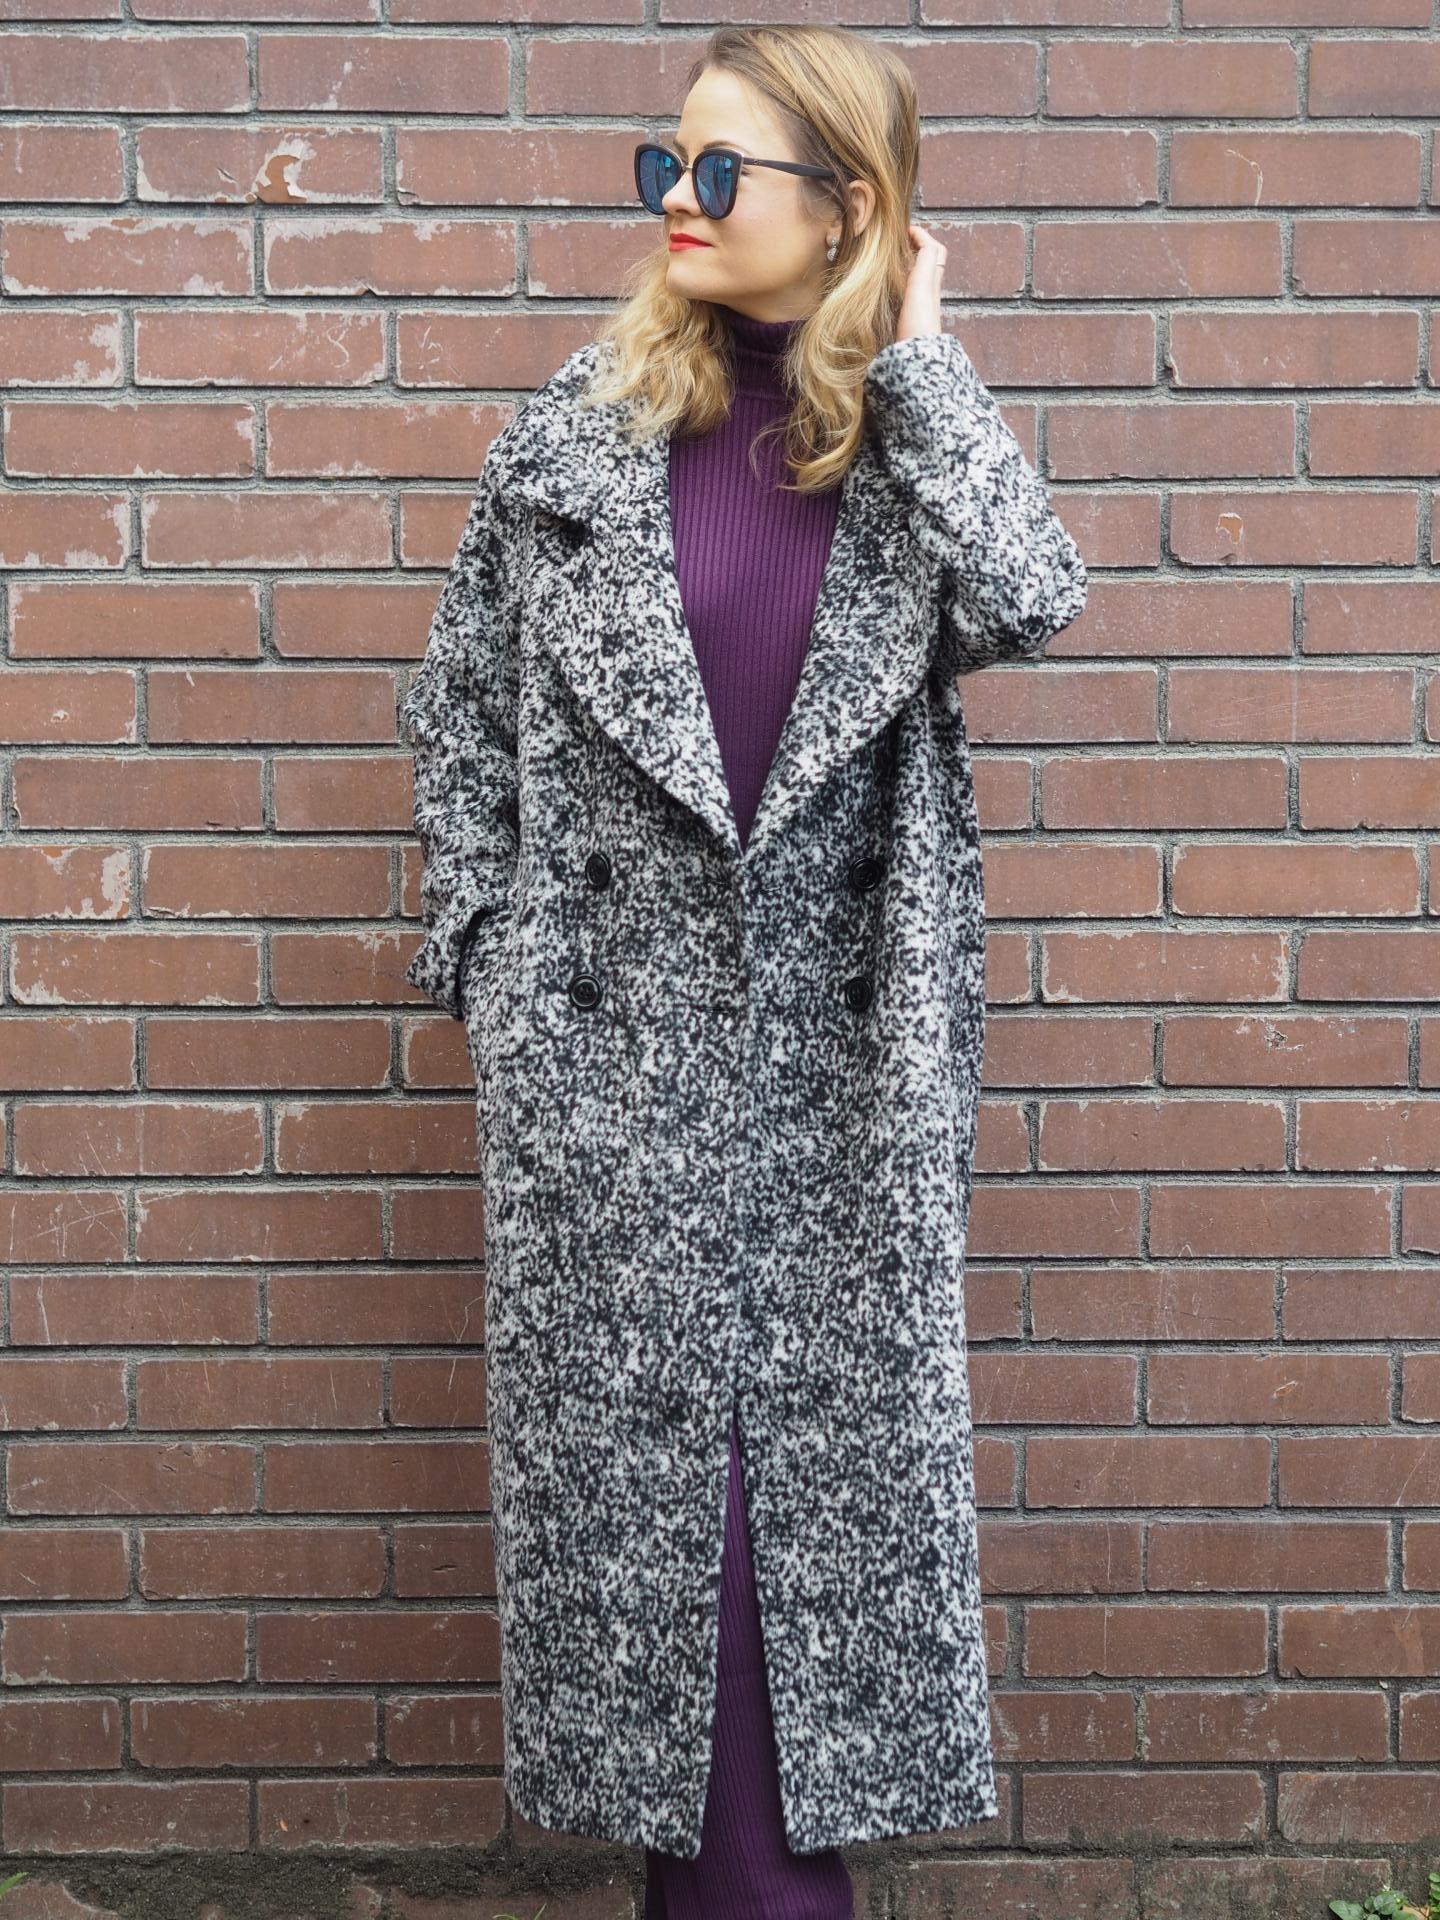 Fashion blogger against brick wall